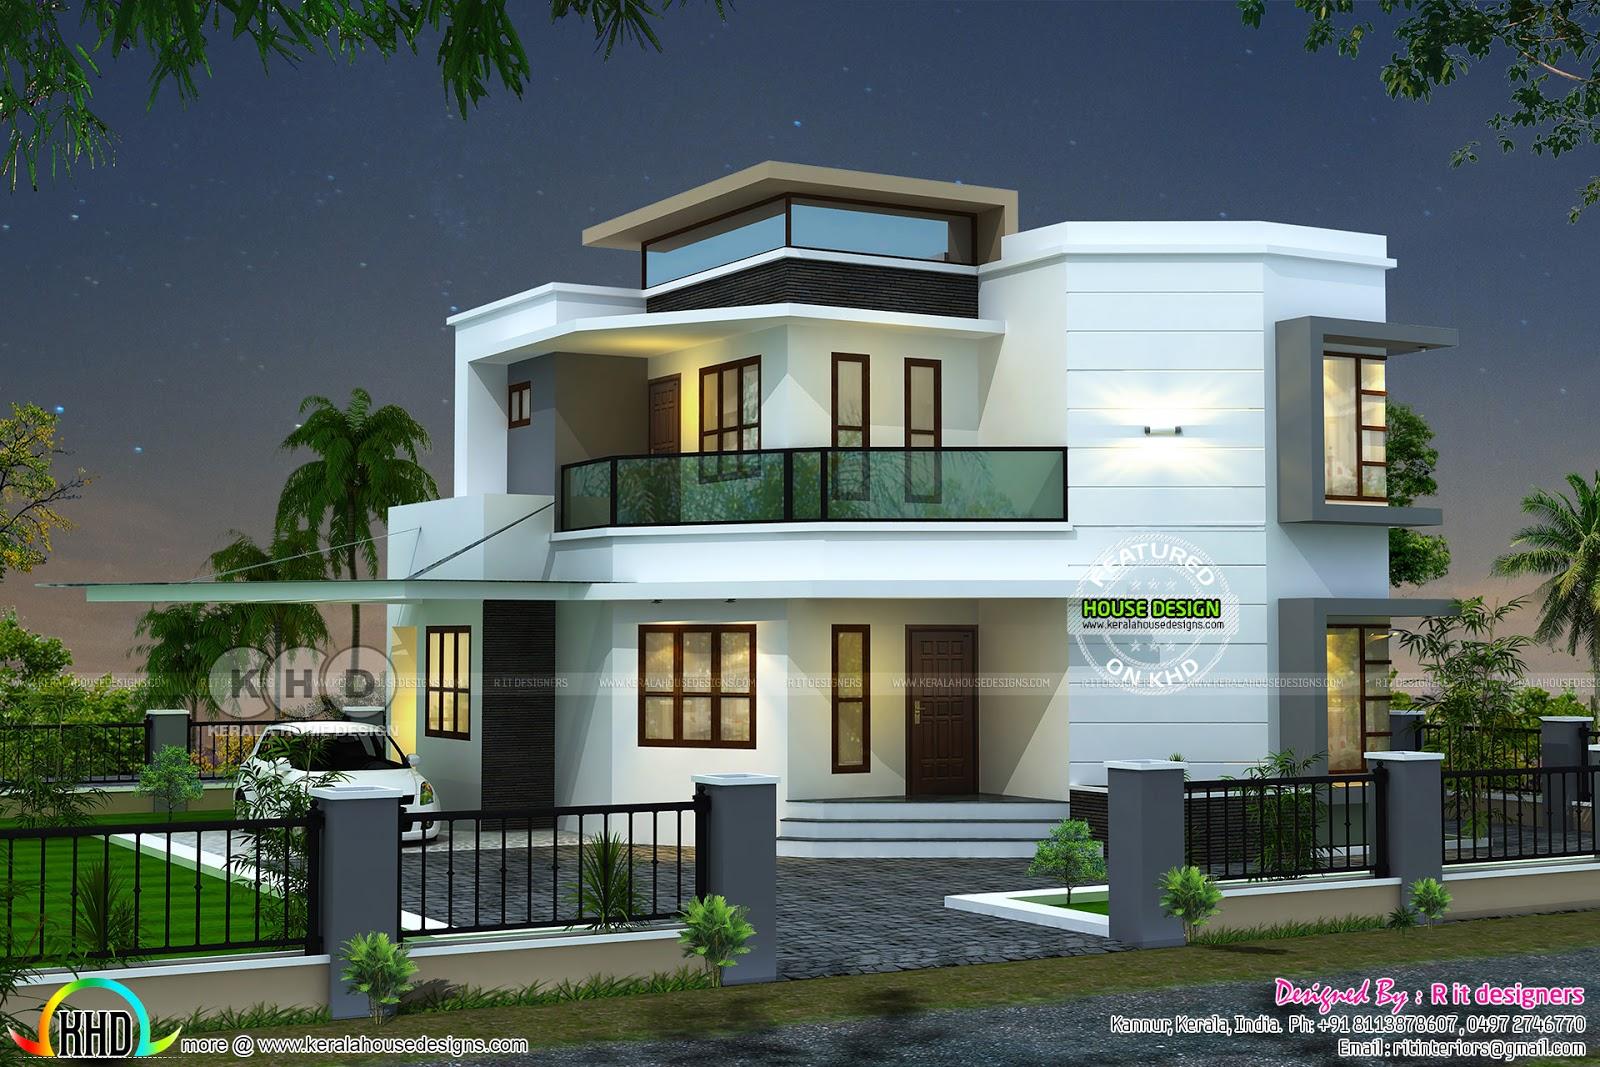 3 bedroom modern house plan - Kerala home design and floor ...